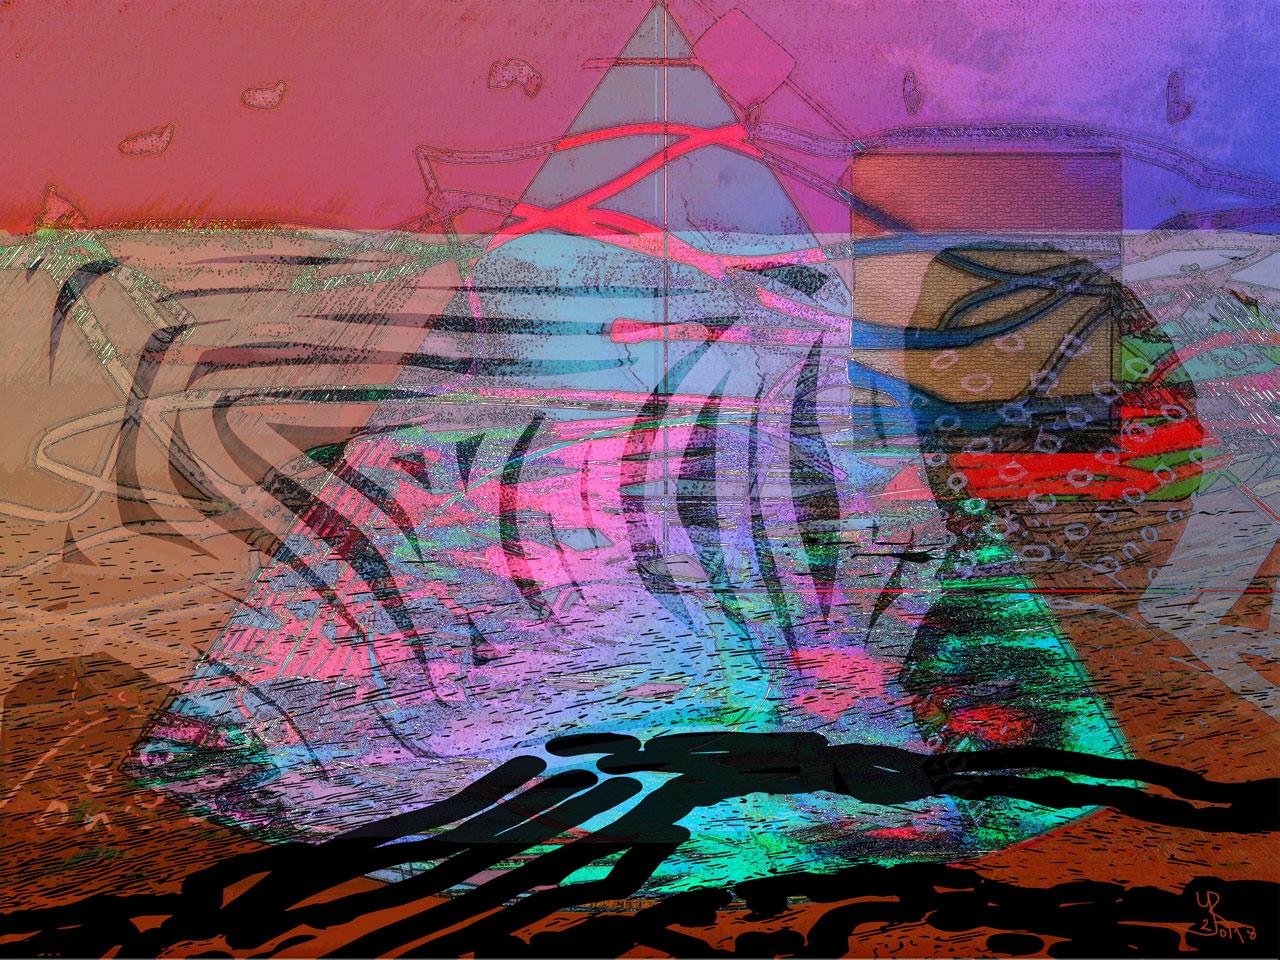 Shackles  (Grilletes) Digital C-Print, 37,5 x 50 cm